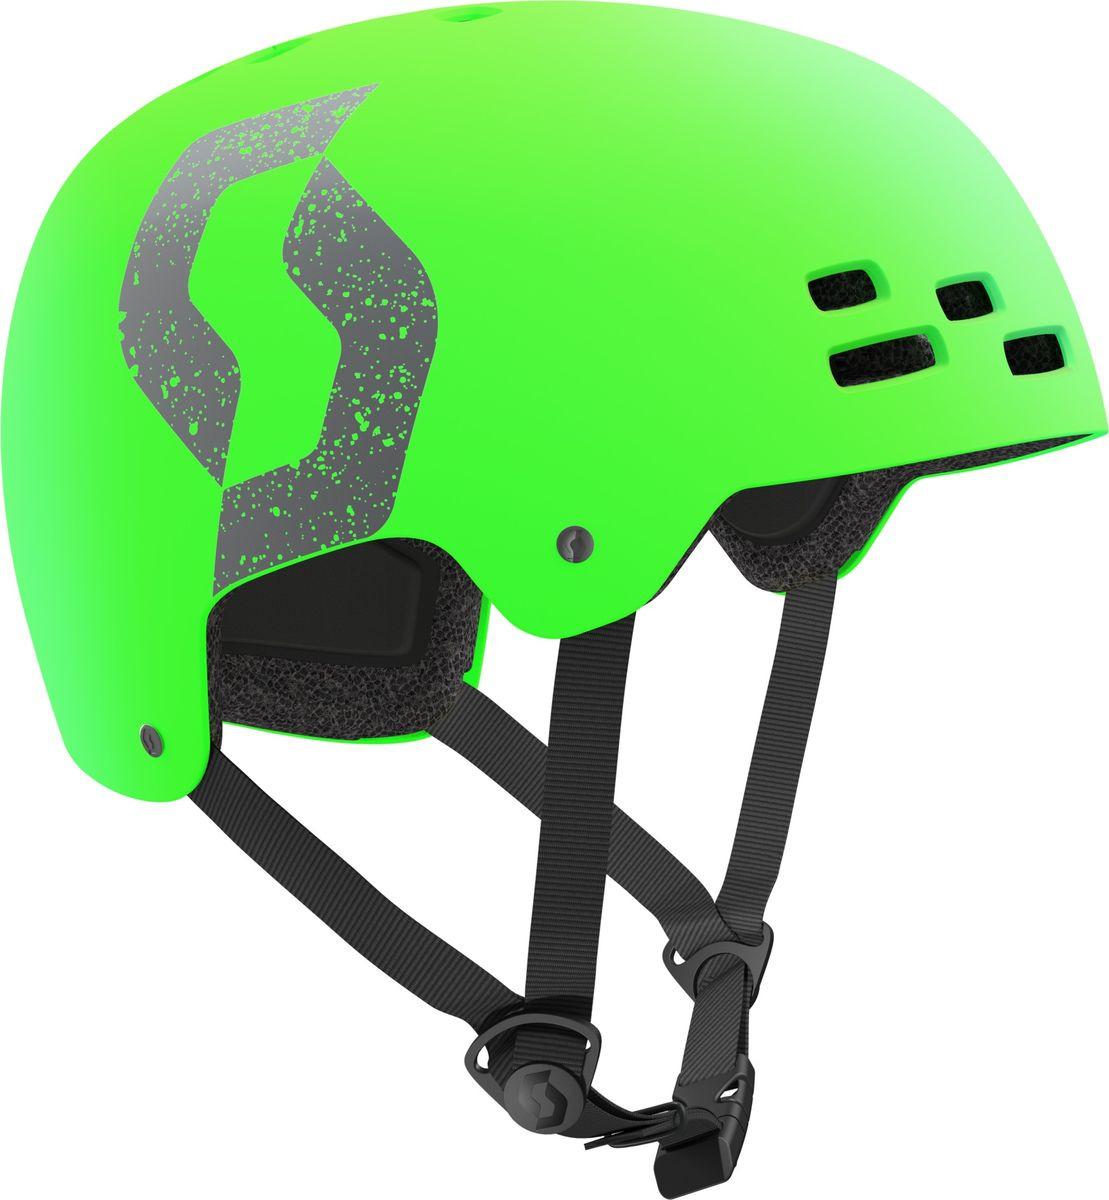 Шлем защитный Scott Jibe, 241260-0375, зеленый, размер M (57/58) scott moeller intelligent m